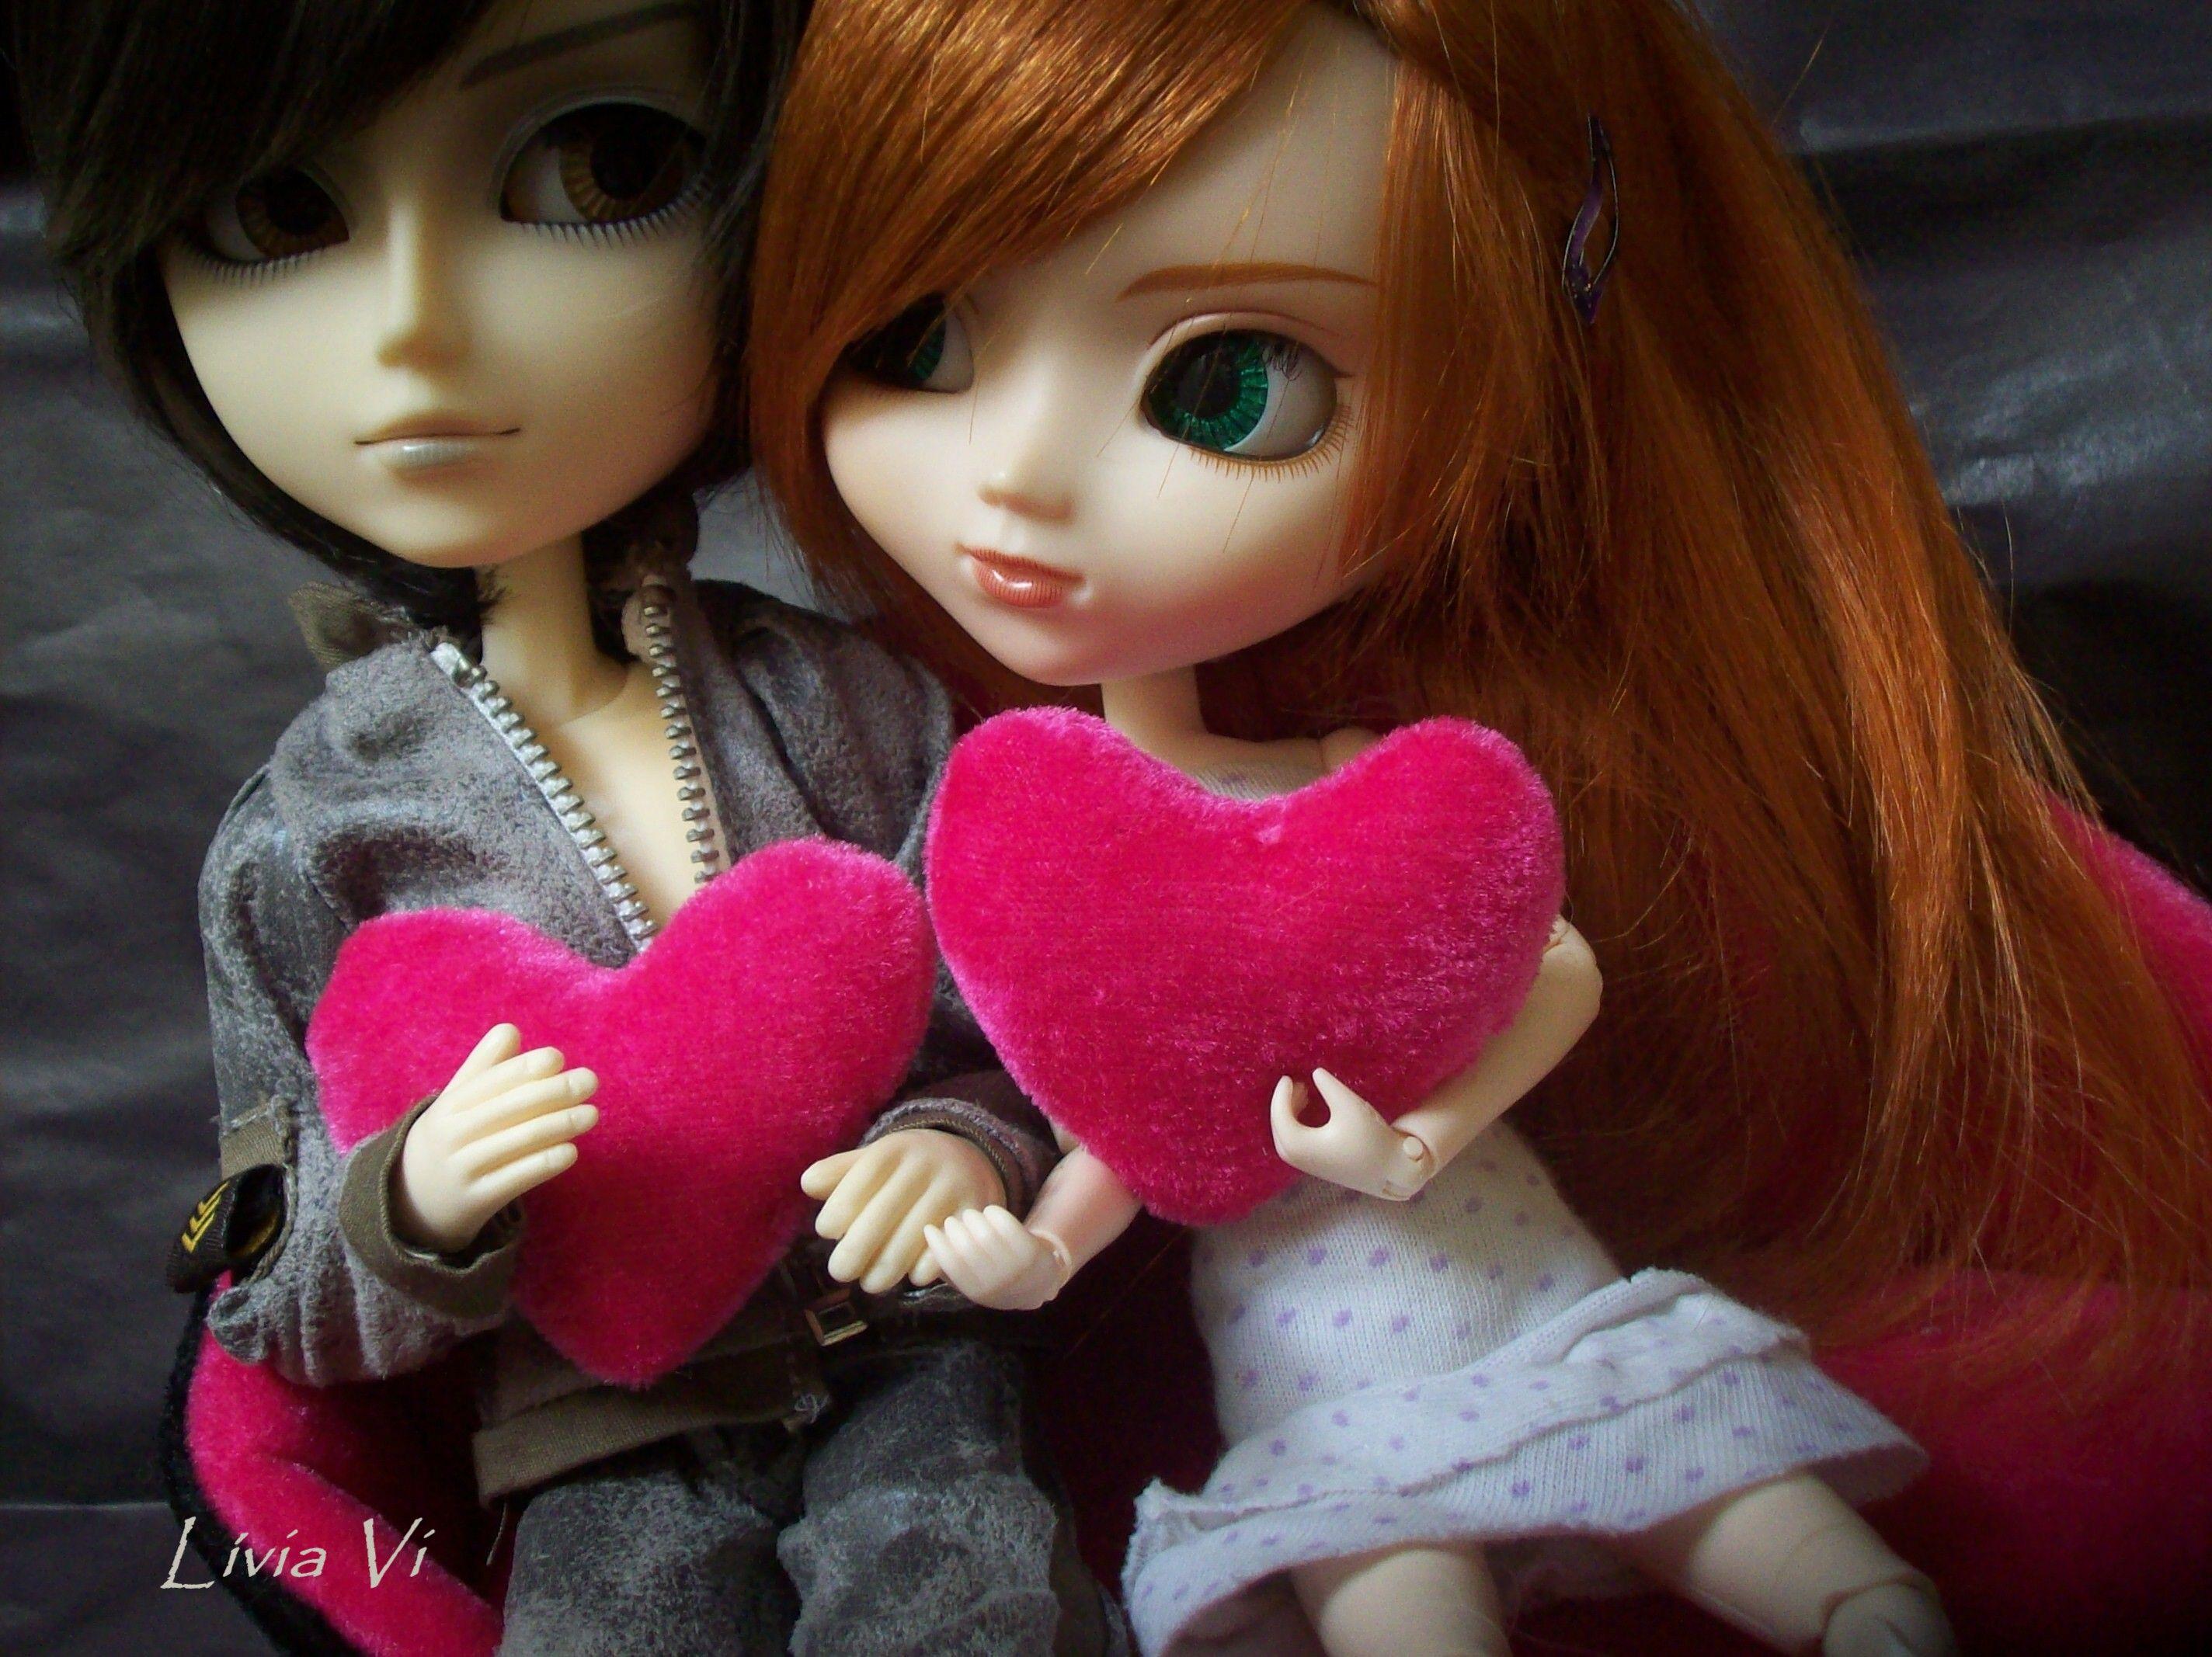 Jamie Taeyang Wayne Emilie Pullip Craziia By Livia Vi Cute Dolls Beautiful Dolls Cute Couple Wallpaper